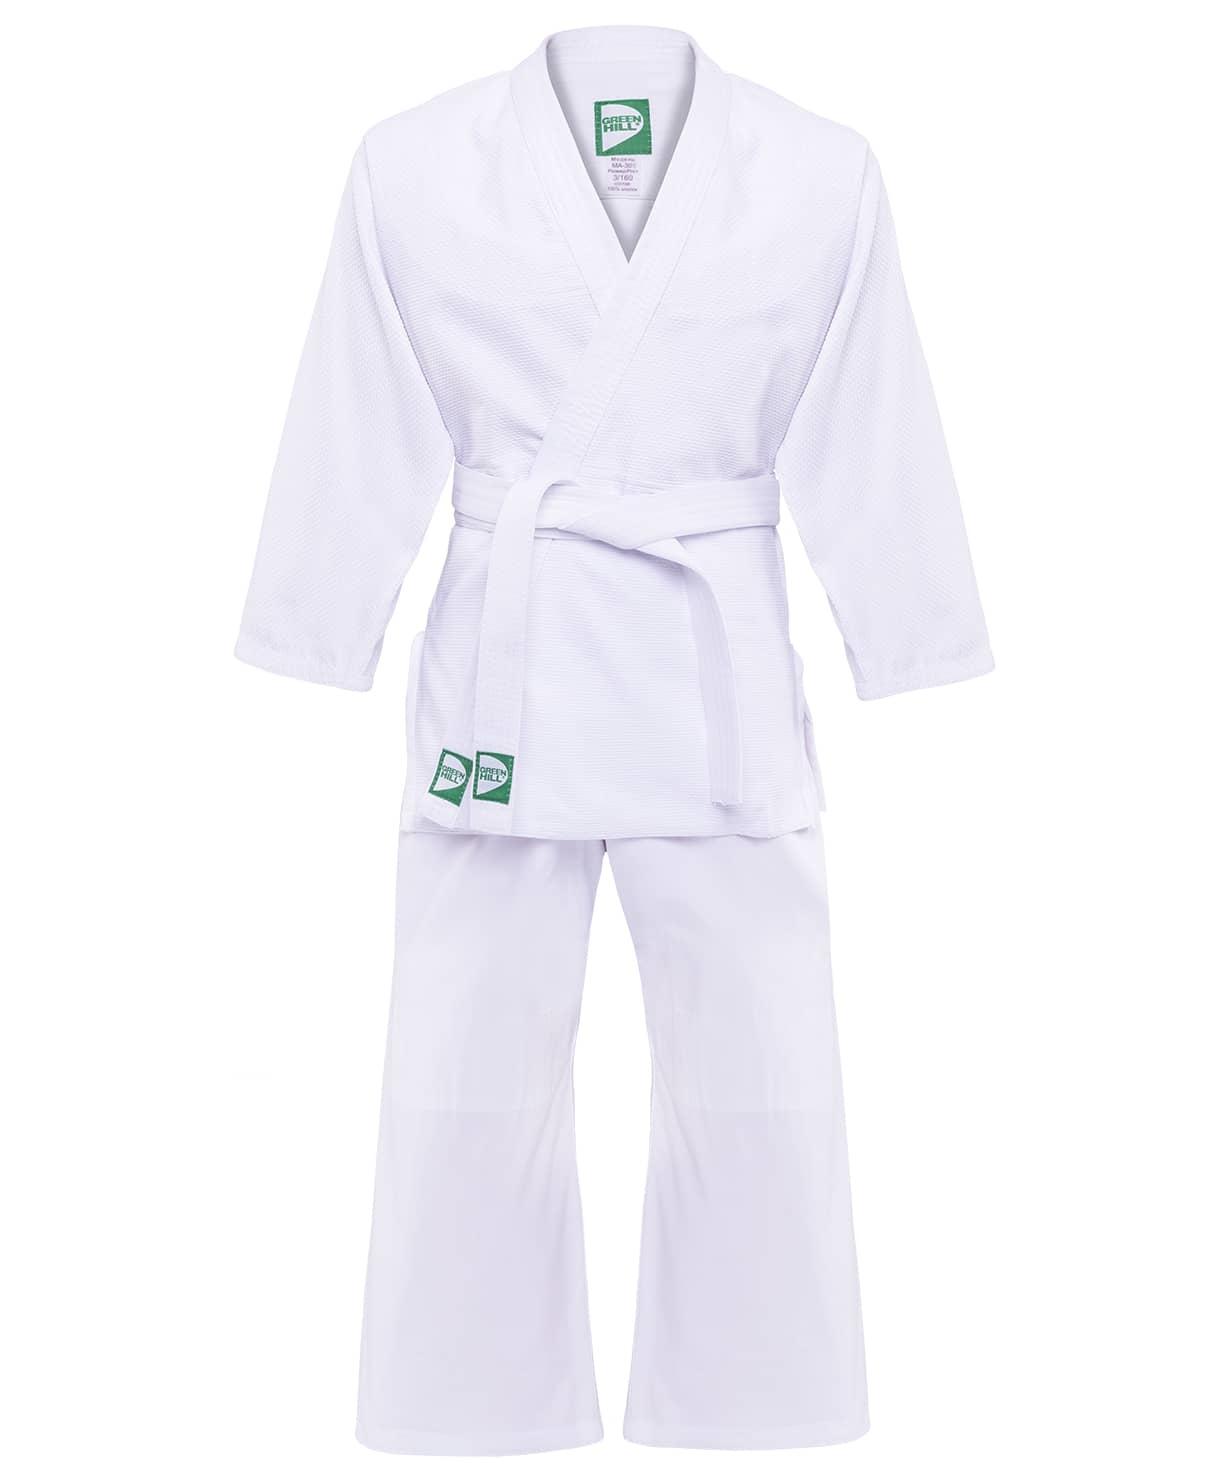 Кимоно для дзюдо MA-302 белый, р.4/170